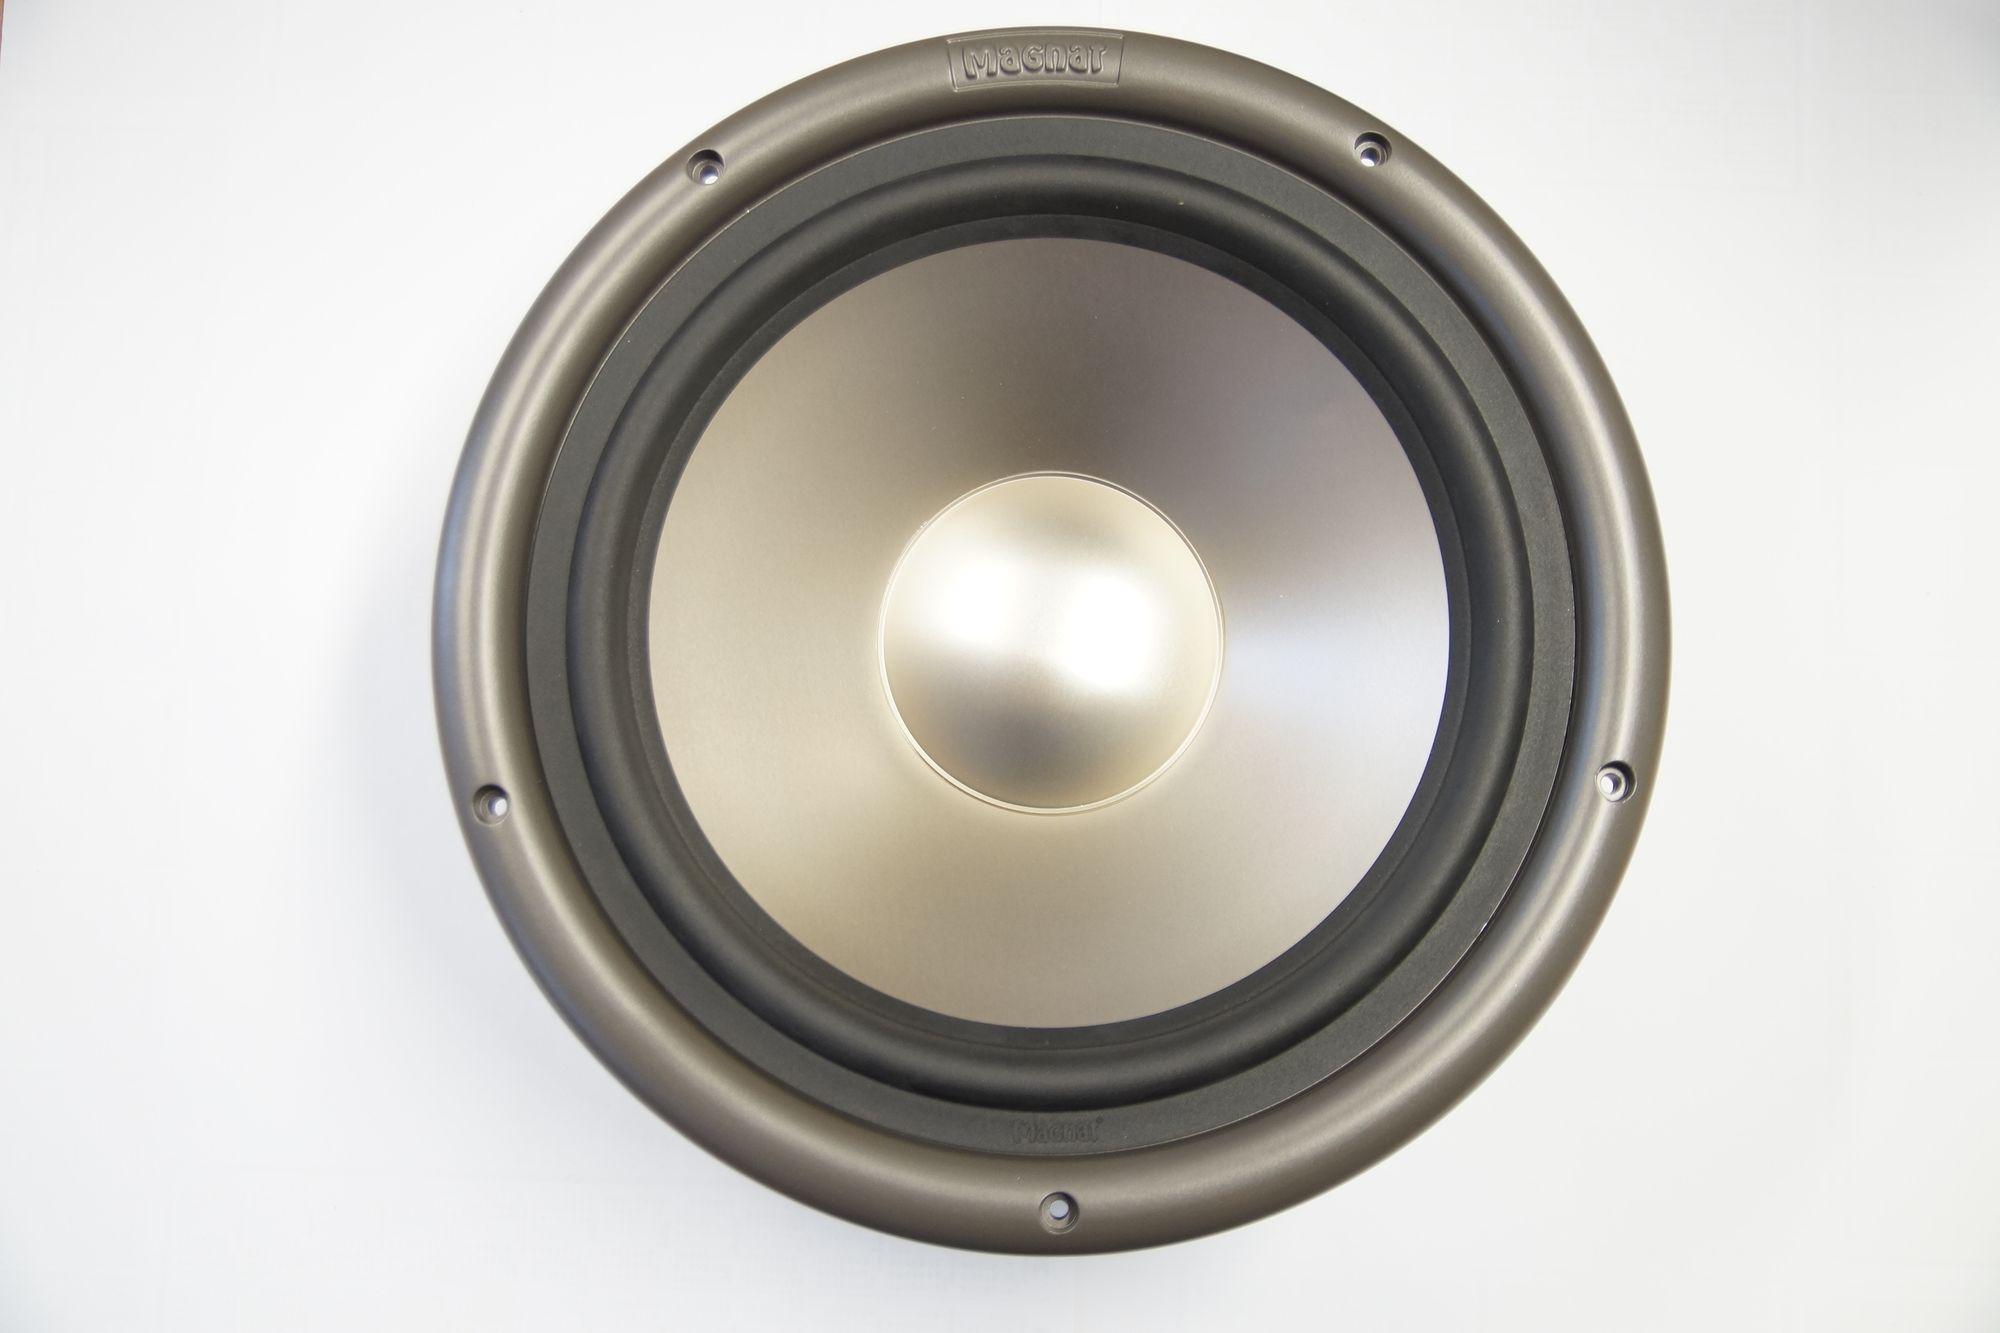 Magnat Vintage 990 Tieftöner MW AL 300 AL 3150  Basslautsprecher 30 cm 12 Zoll 001